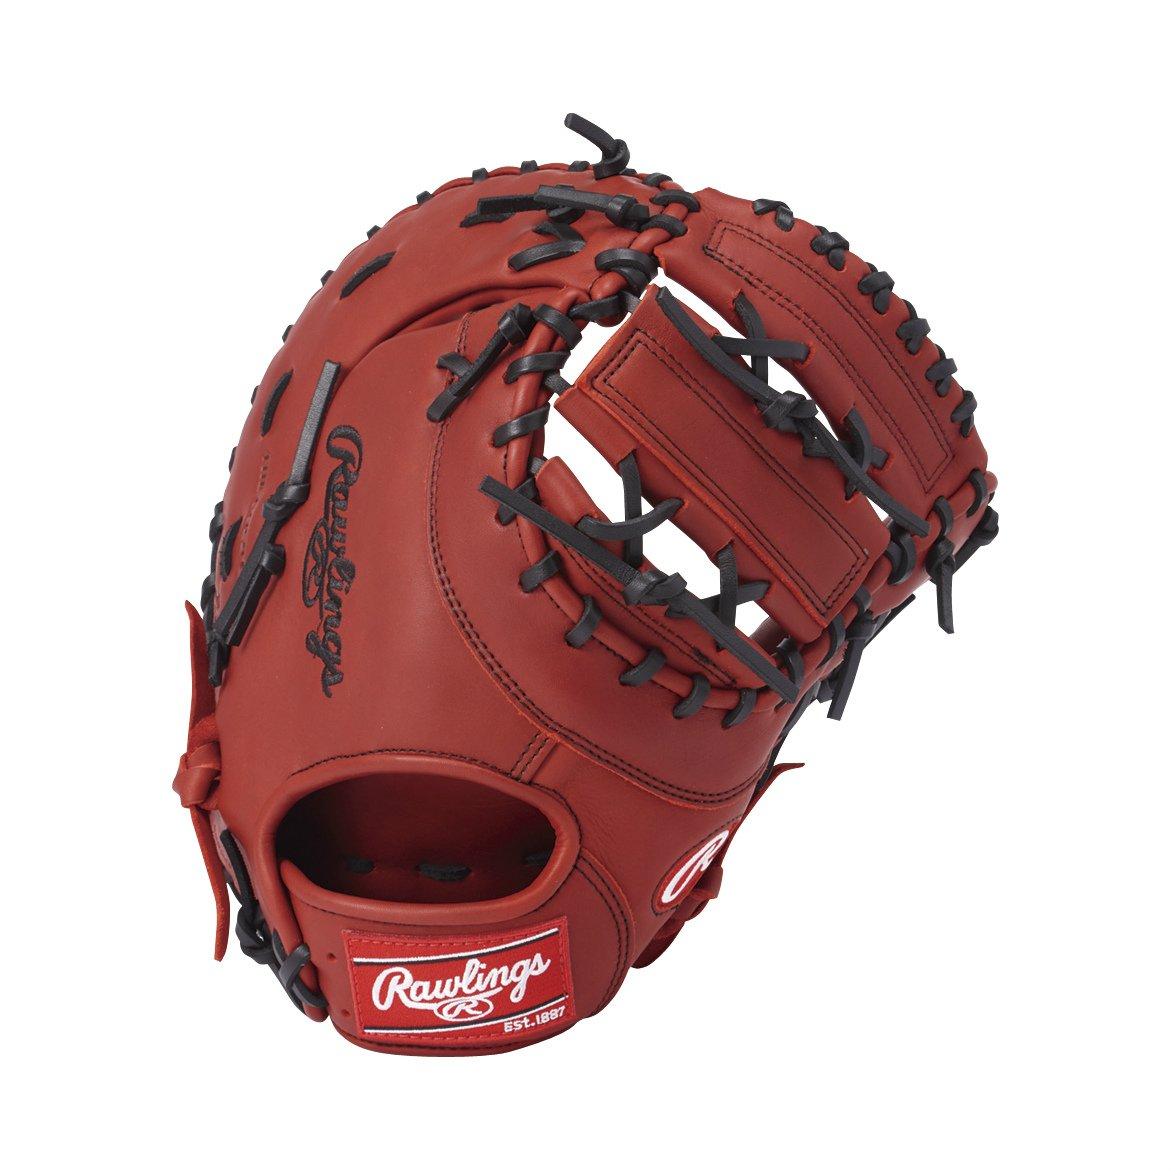 Rawlings(ローリングス) ソフトボール用 ソフト HYPER TECH DP[ファースト用] GS8HT3ACD B075Z5GMY4 [サイズ 12.5] [12 1/2inch] RH(Left hand throw)※左投用|レッド レッド [サイズ 12.5] [12 1/2inch] RH(Left hand throw)※左投用